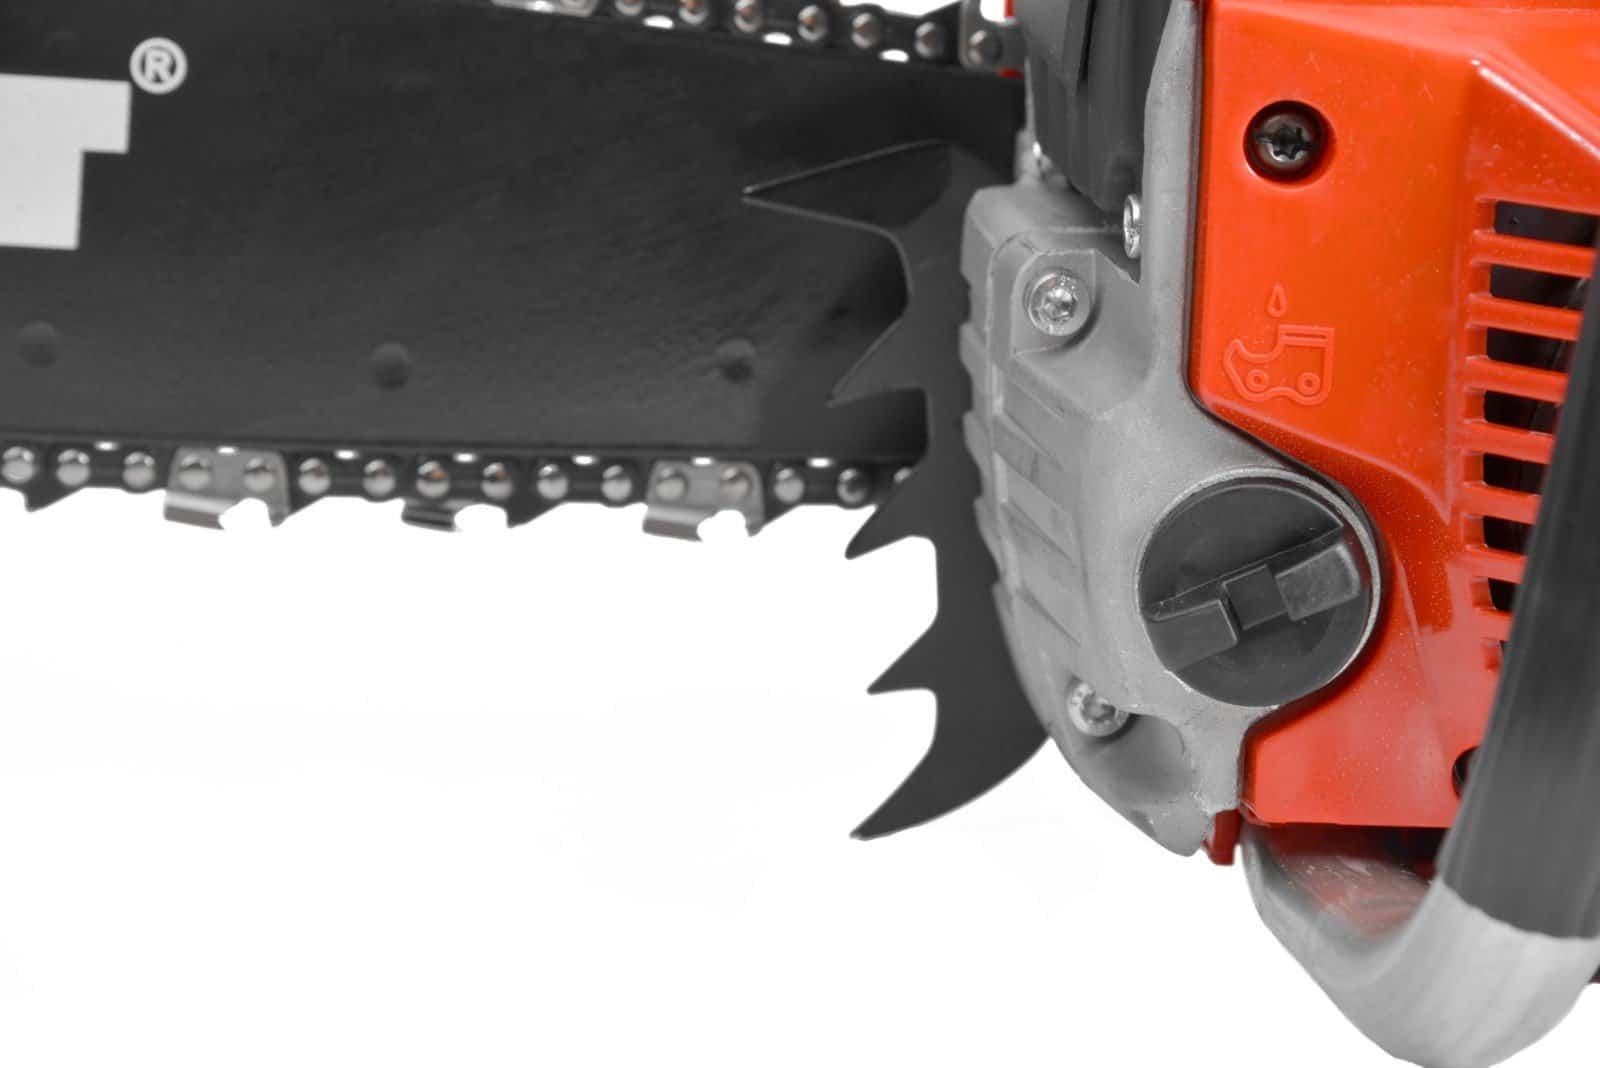 Motosserra HCT CS 45cc - 2.7 HP  - Potencia e Fiabilidade